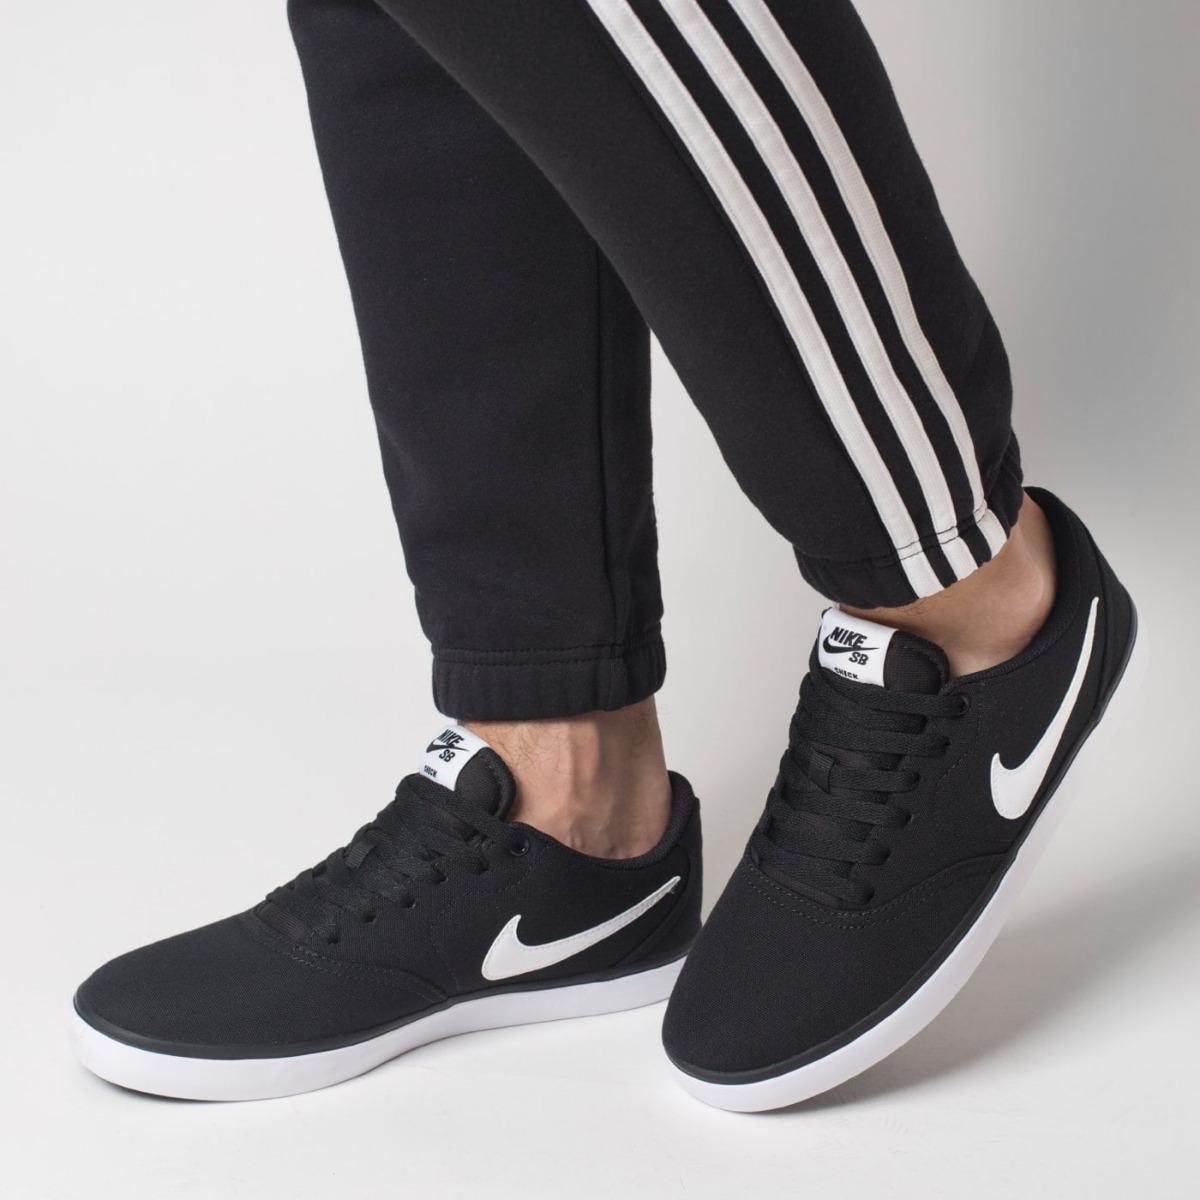 Zapatillas De Hombre Nike Sb Check Solar Cnvs Skate Nuevo